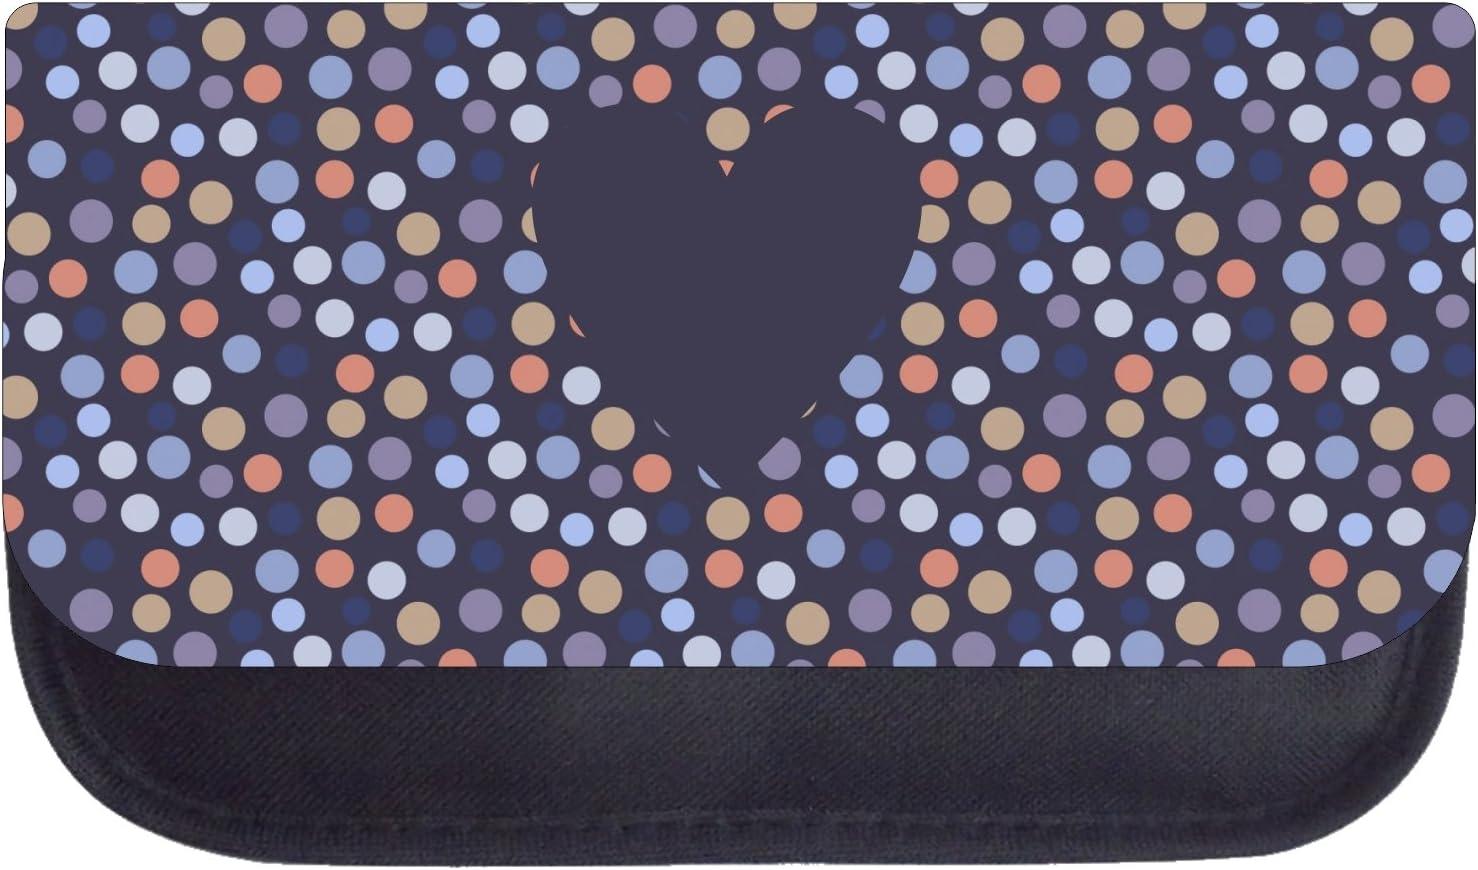 Heart on Polka Dots Black School Backpack /& Pencil Bag Set